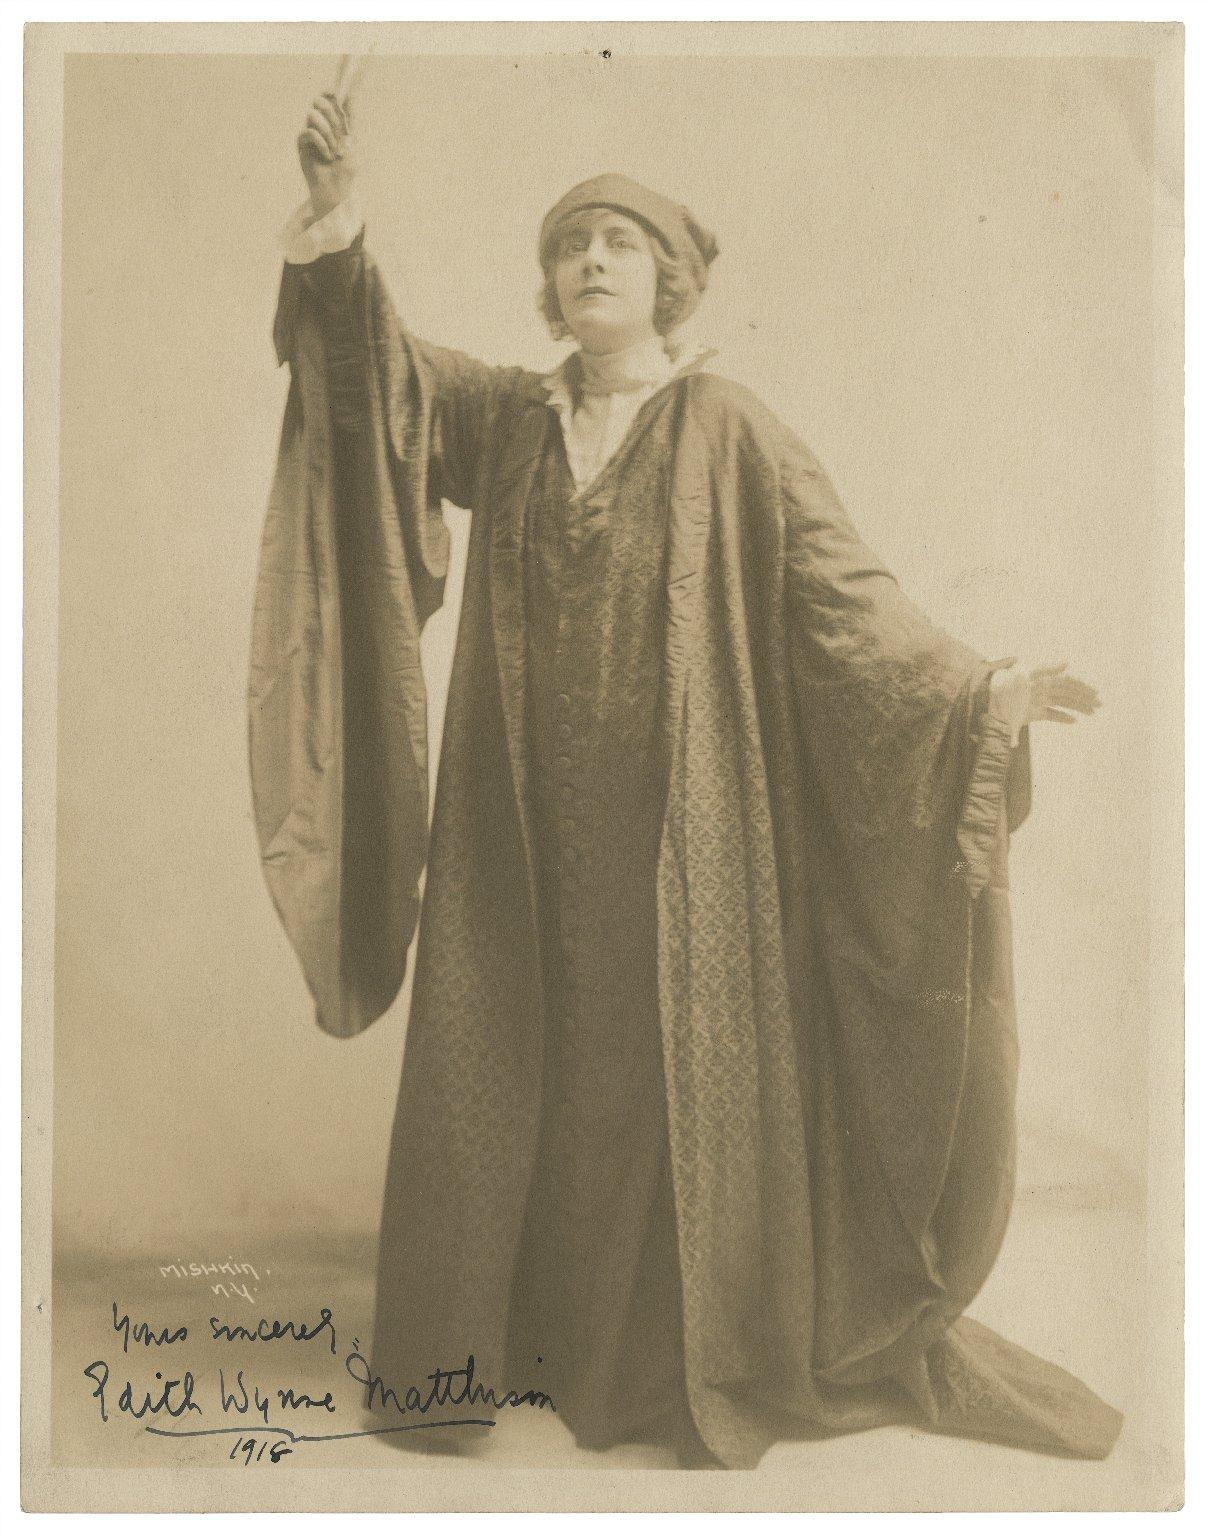 [Edith Wynne Matthison as Portia in Shakespeare's Merchant of Venice] [graphic] / Mishkin.